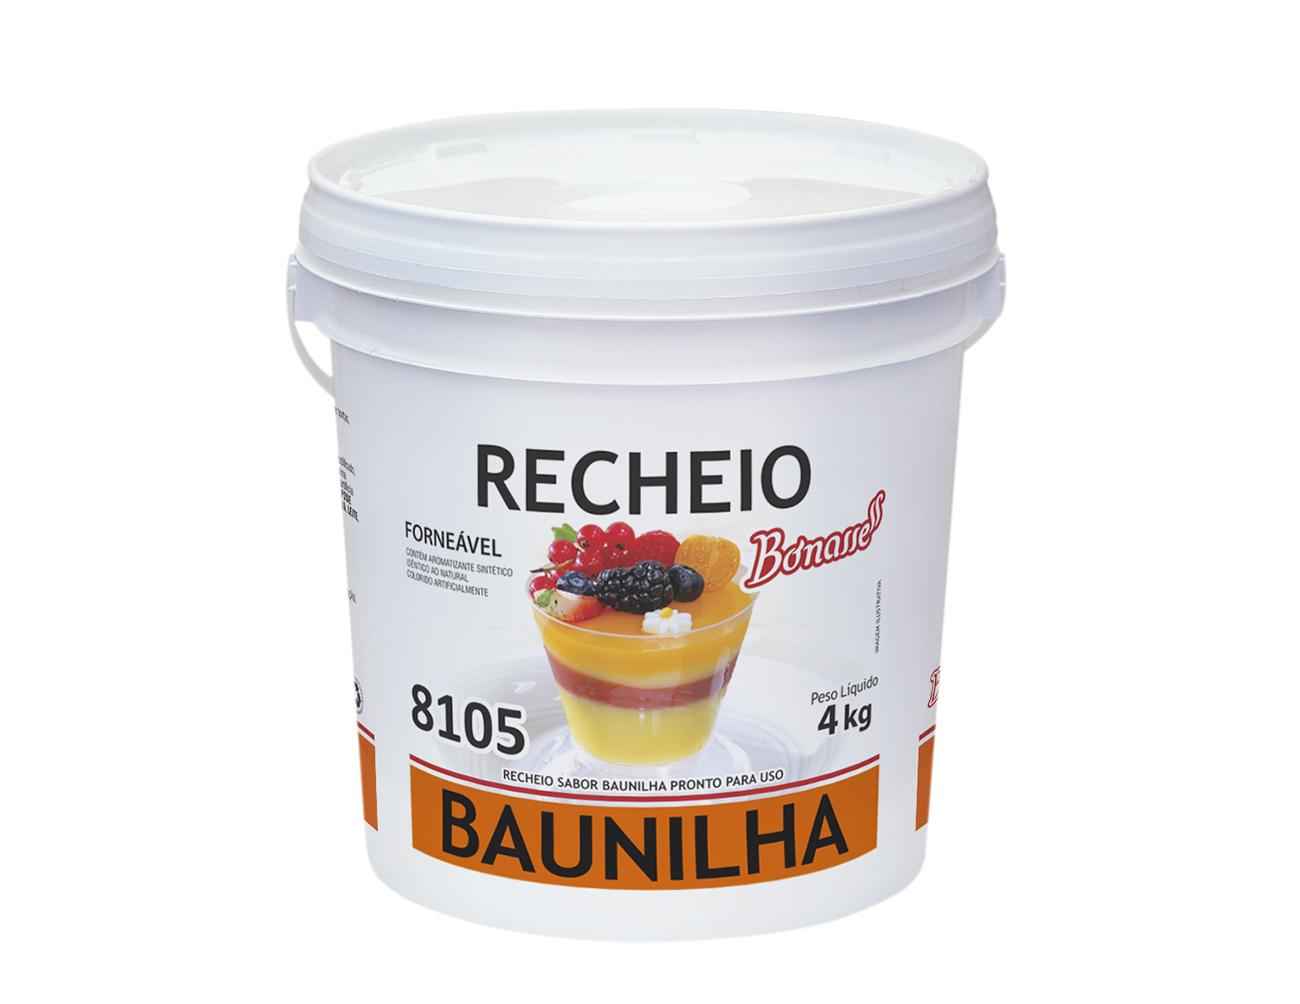 Recheio Baunilha